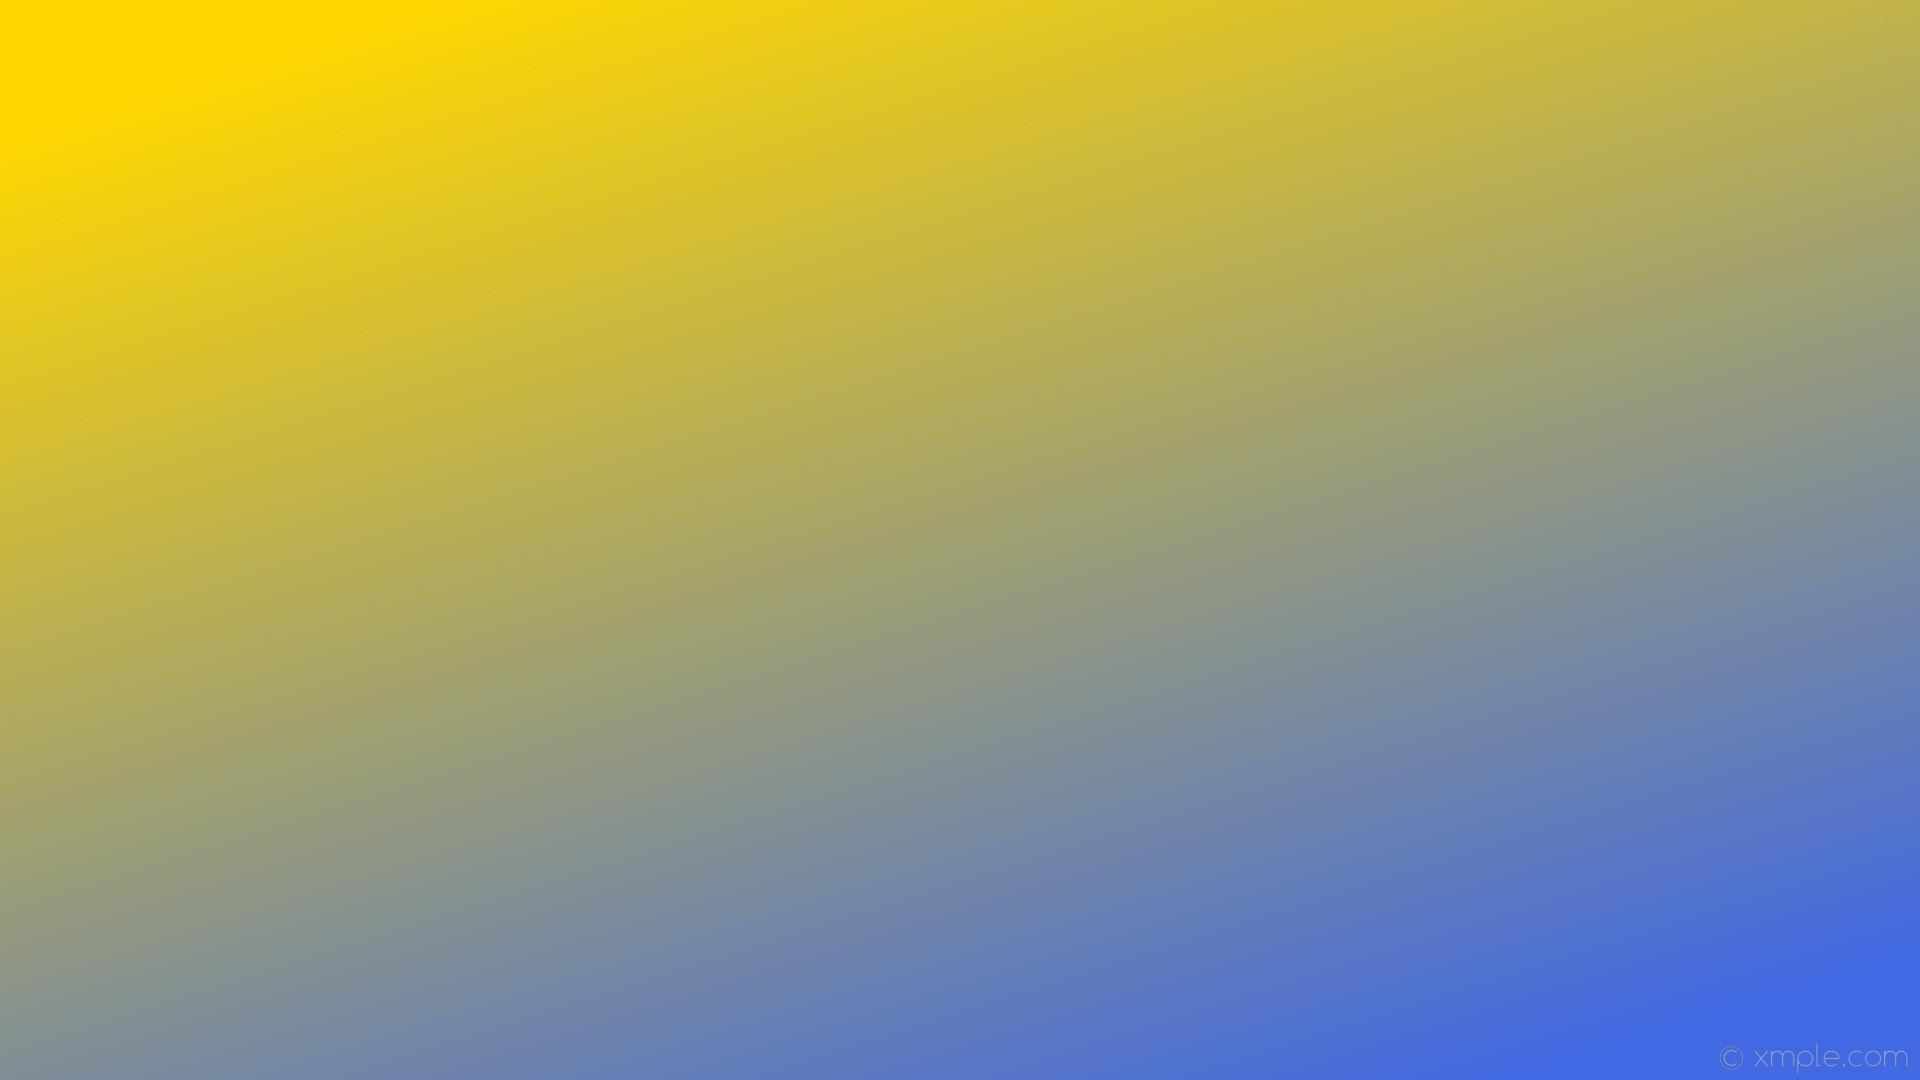 wallpaper yellow gradient linear blue gold royal blue #ffd700 #4169e1 135°